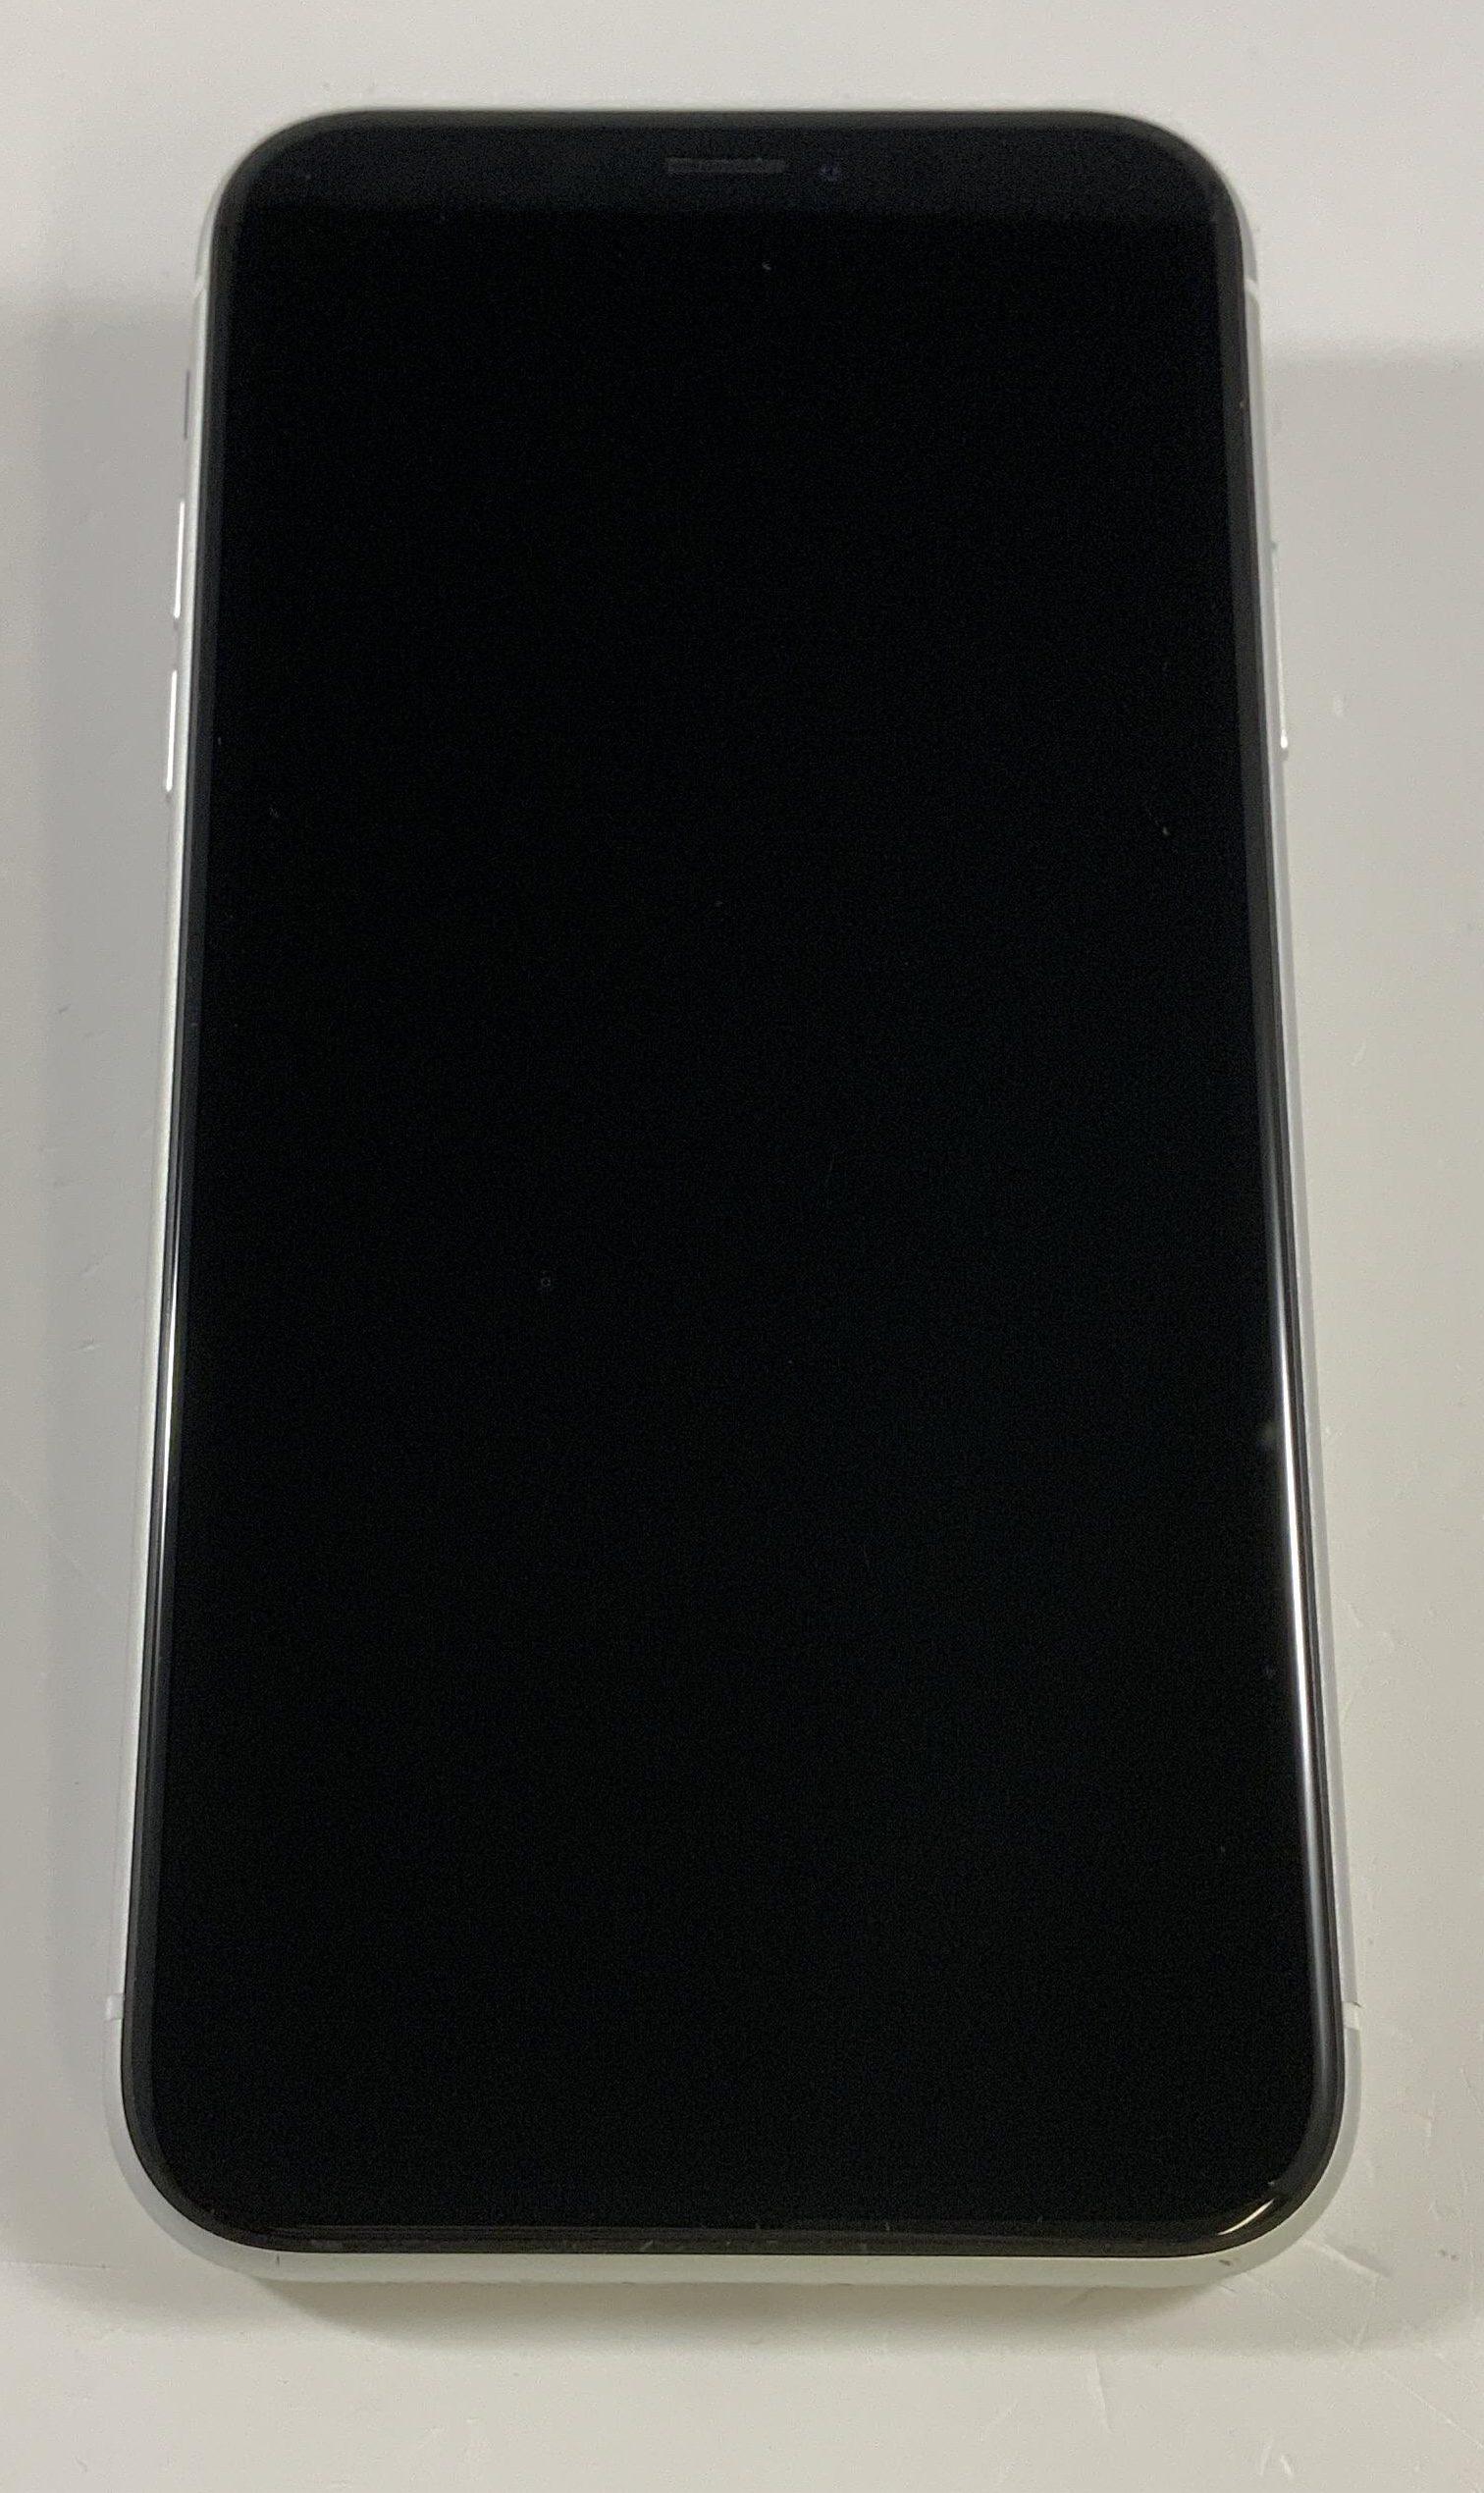 iPhone XR 128GB, 128GB, White, Afbeelding 1